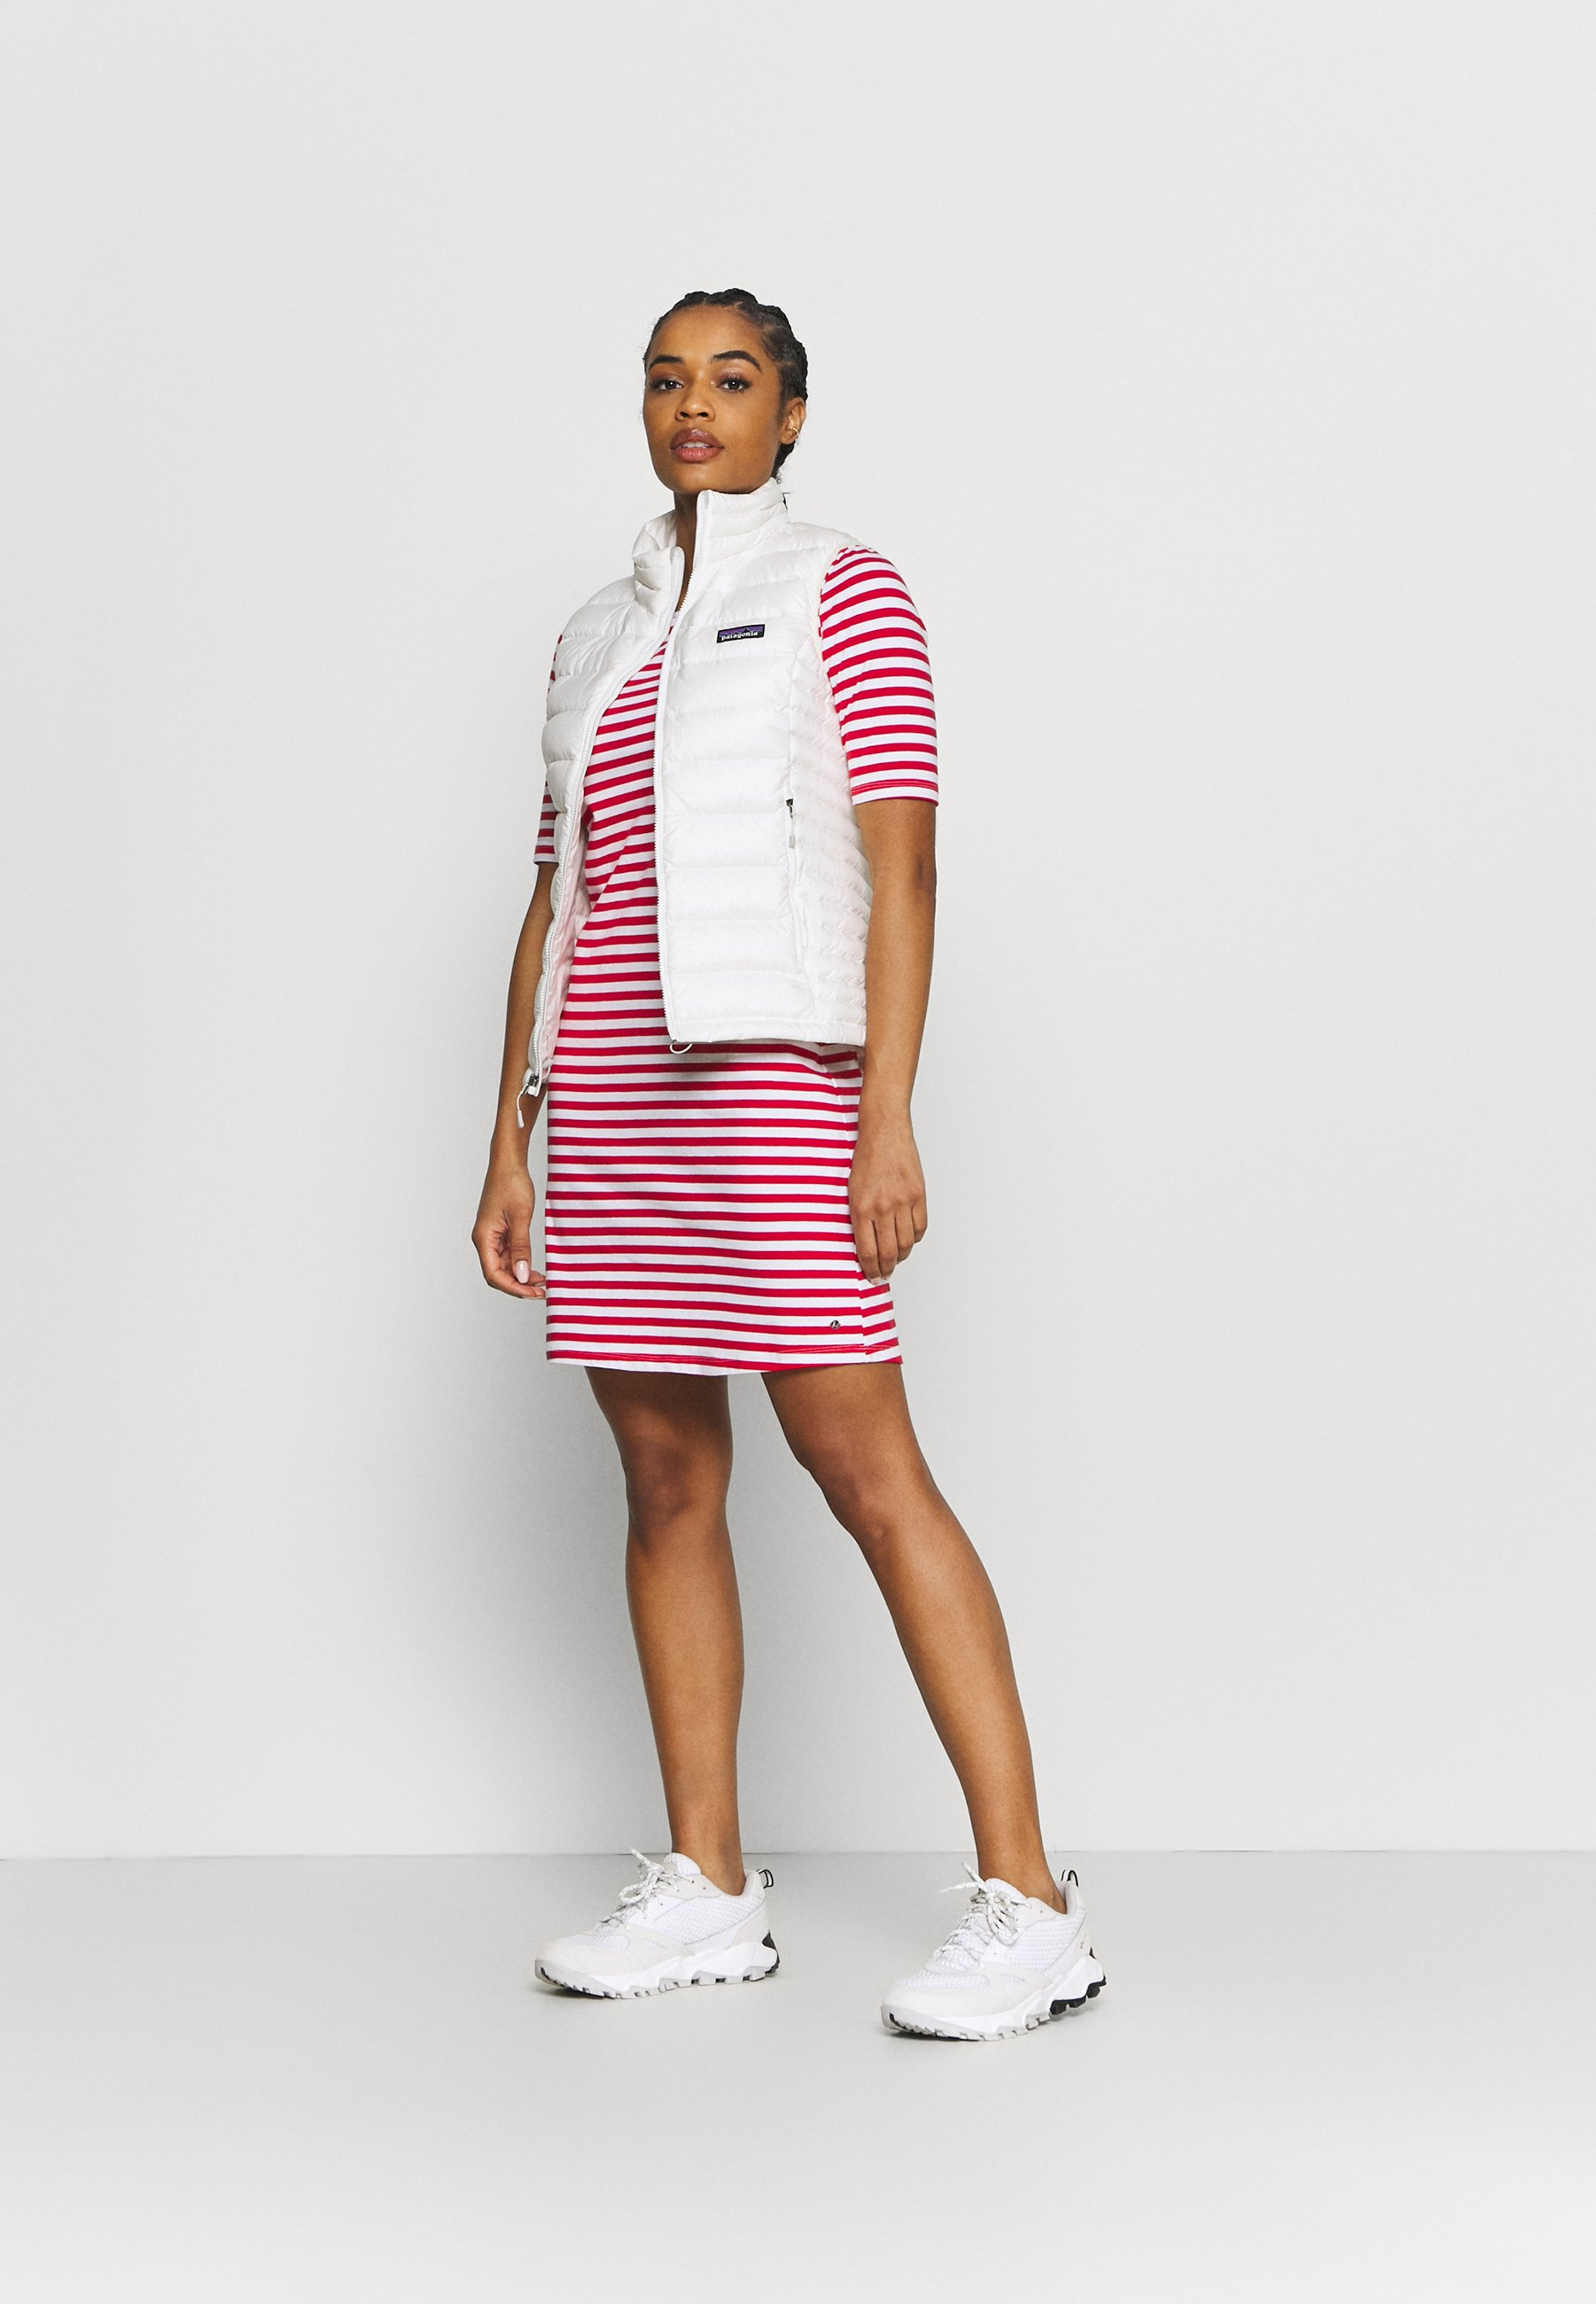 Women LUHTA ALISIPPOLA - Jersey dress